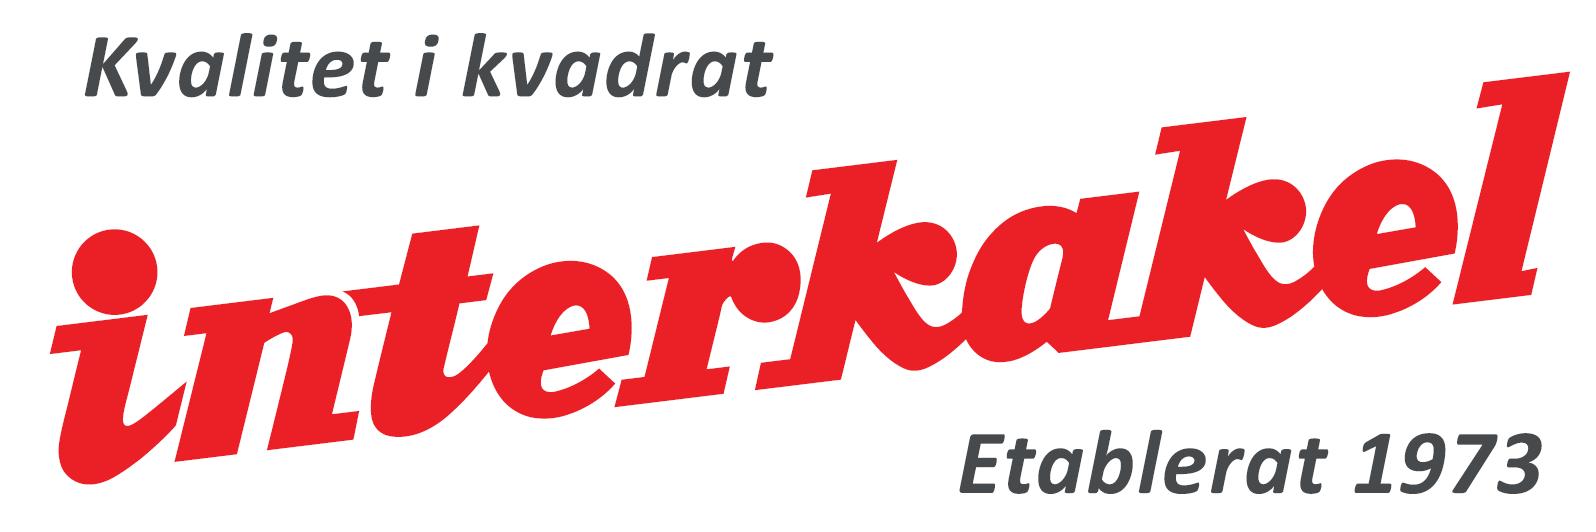 interkakel